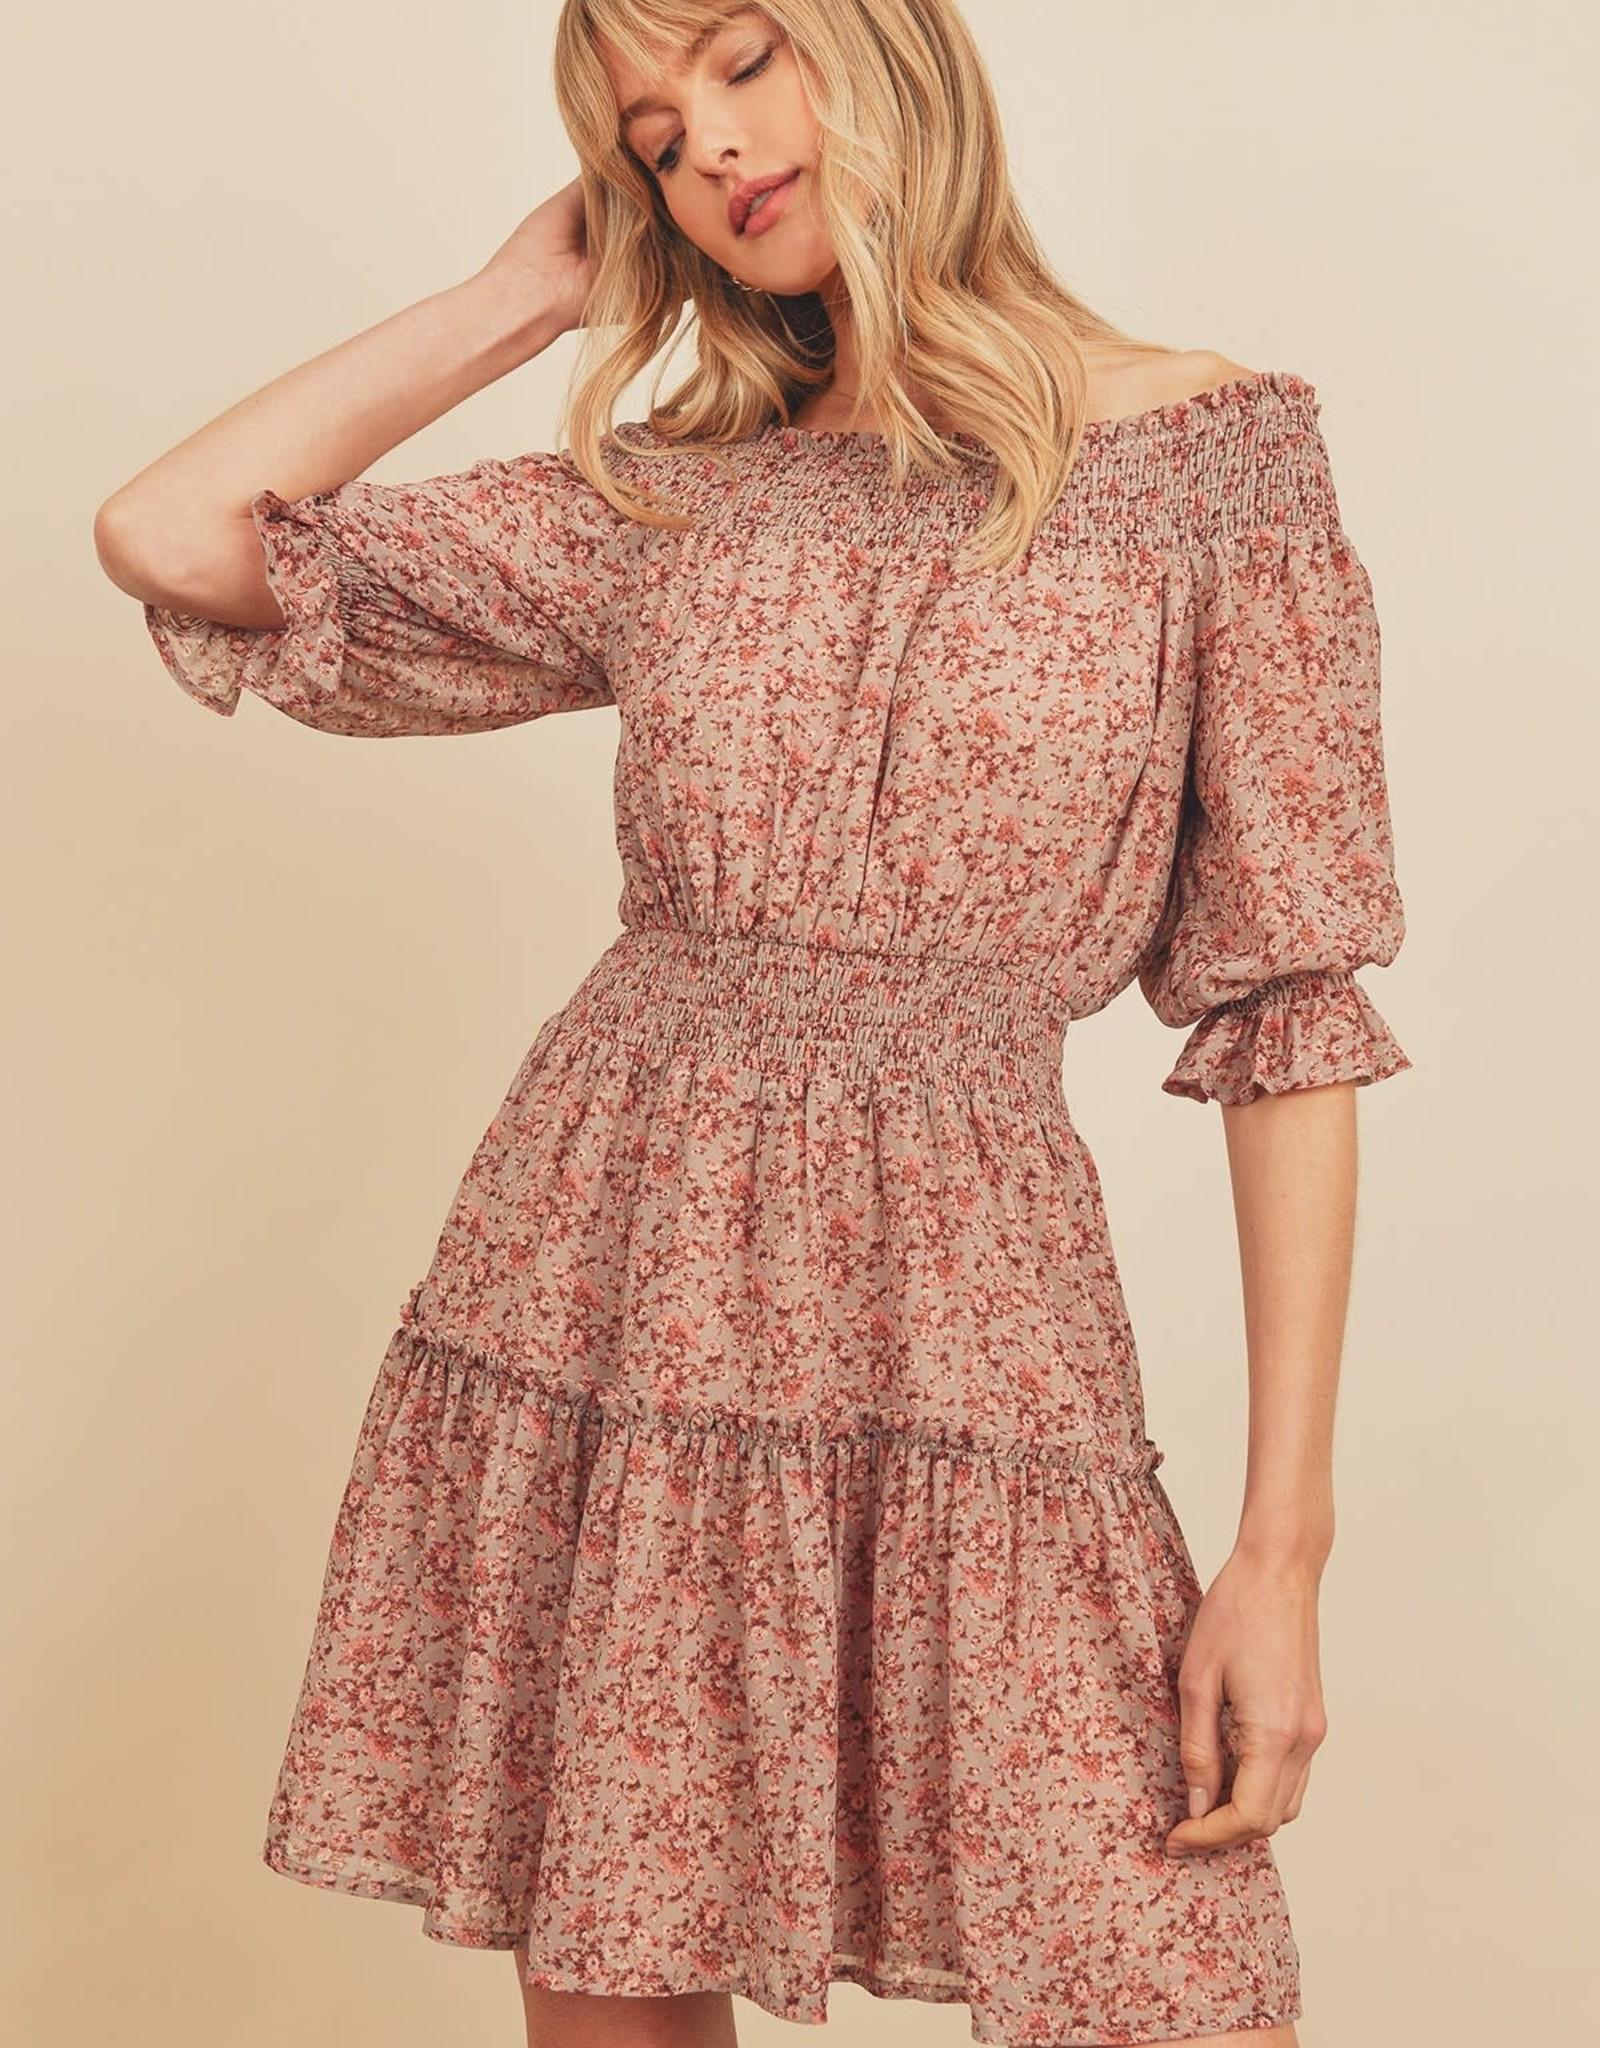 Miss Bliss Ruffle Sleeve Off Shoulder Dress- Rose